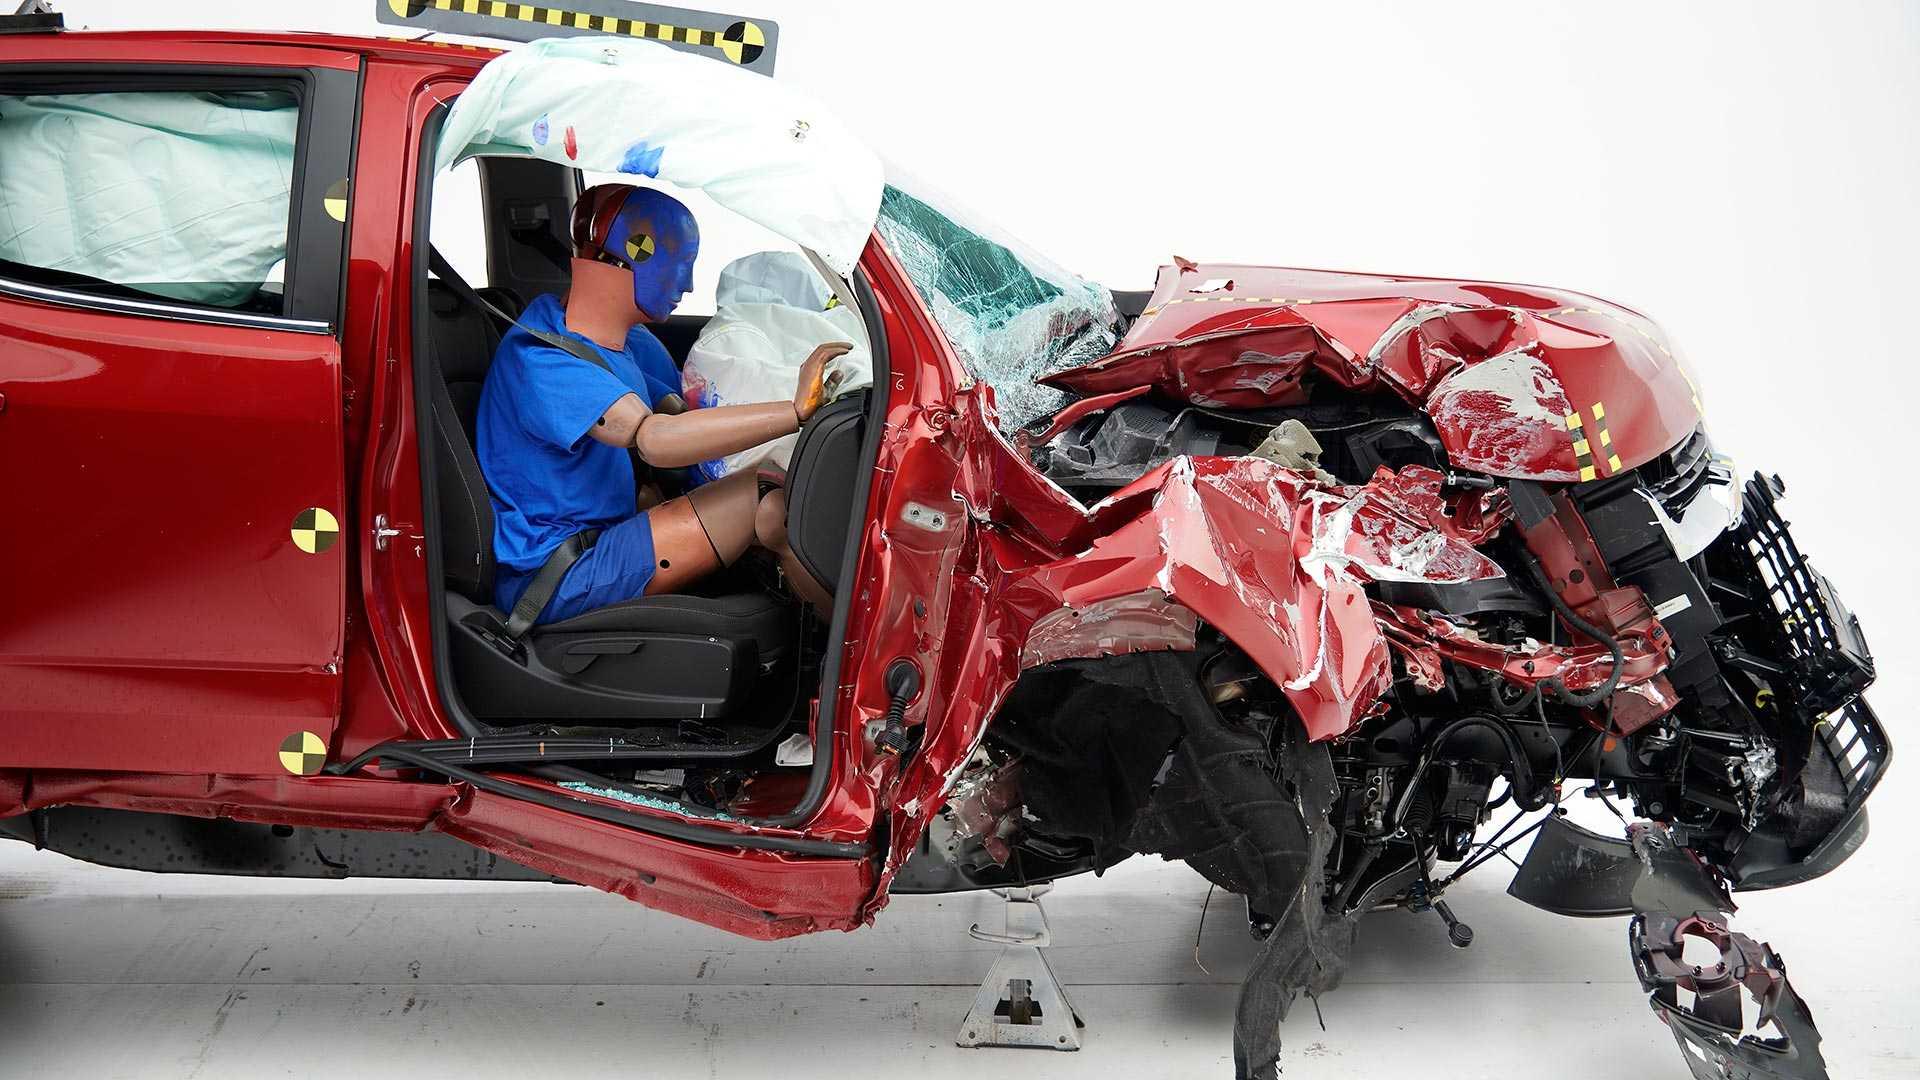 2019-chevrolet-colorado-crew-cab-crash-test (2)